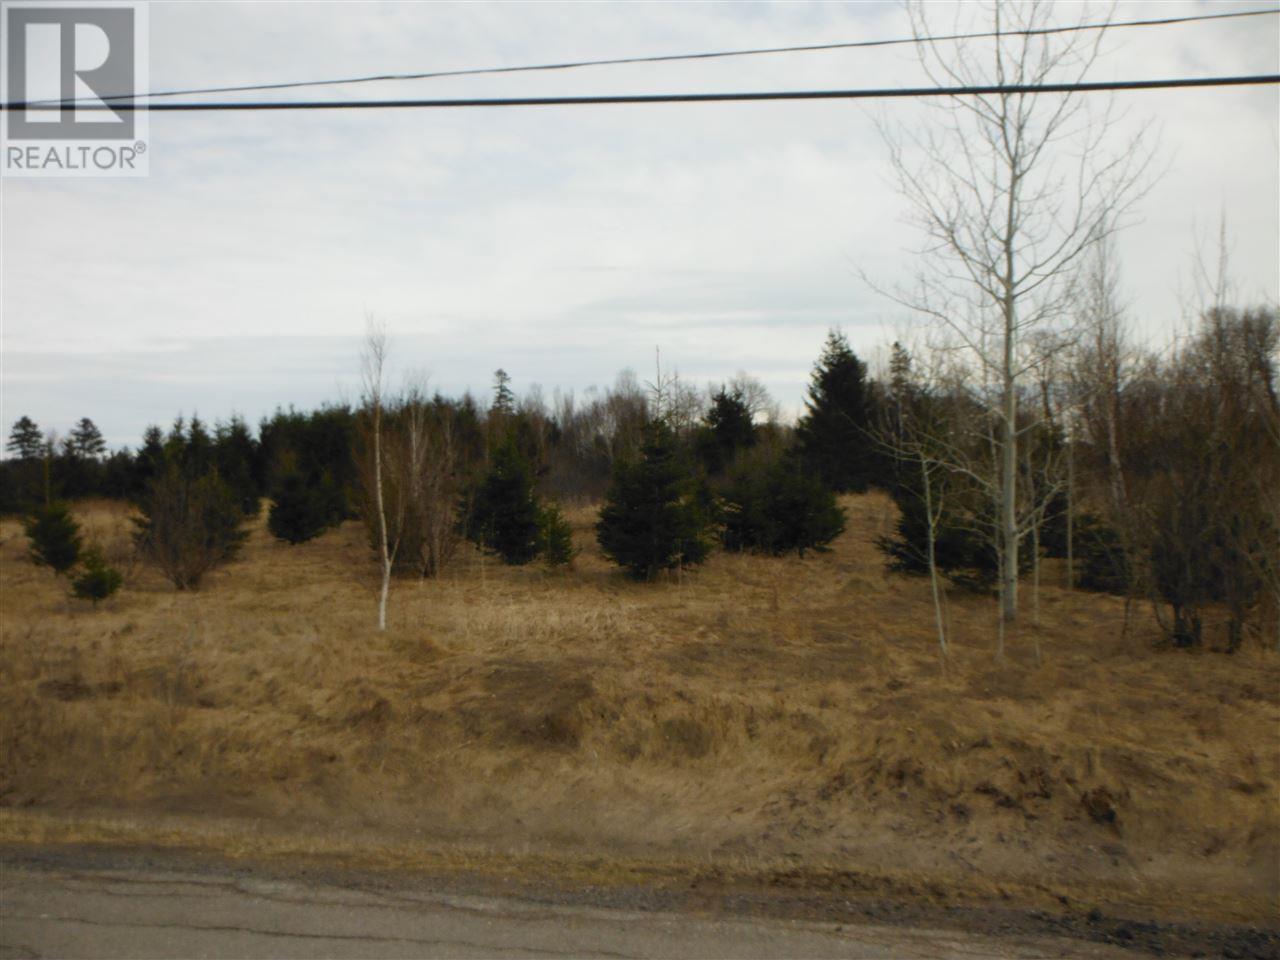 Lot 1-16 Royalty Junction Road, Charlottetown, Prince Edward Island  C1E 1Z2 - Photo 8 - 202006111